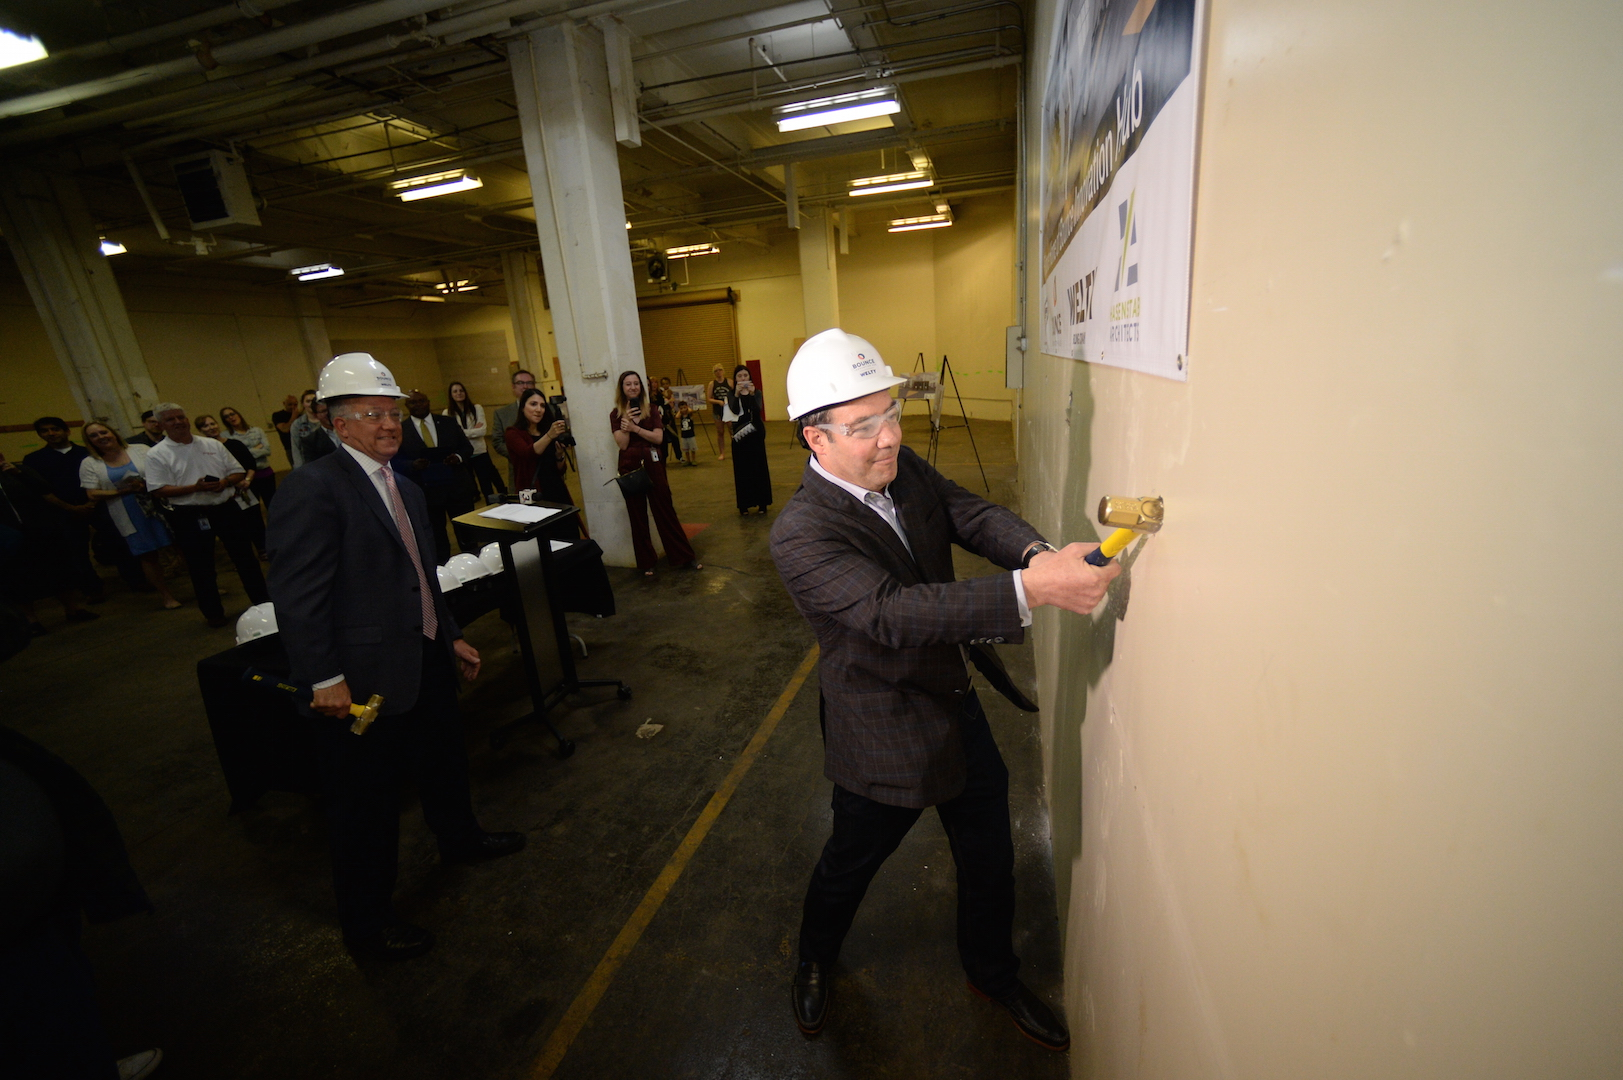 First floor wall-breaking ceremony with Doug Weintraub and Akron mayor Dan Horrigan